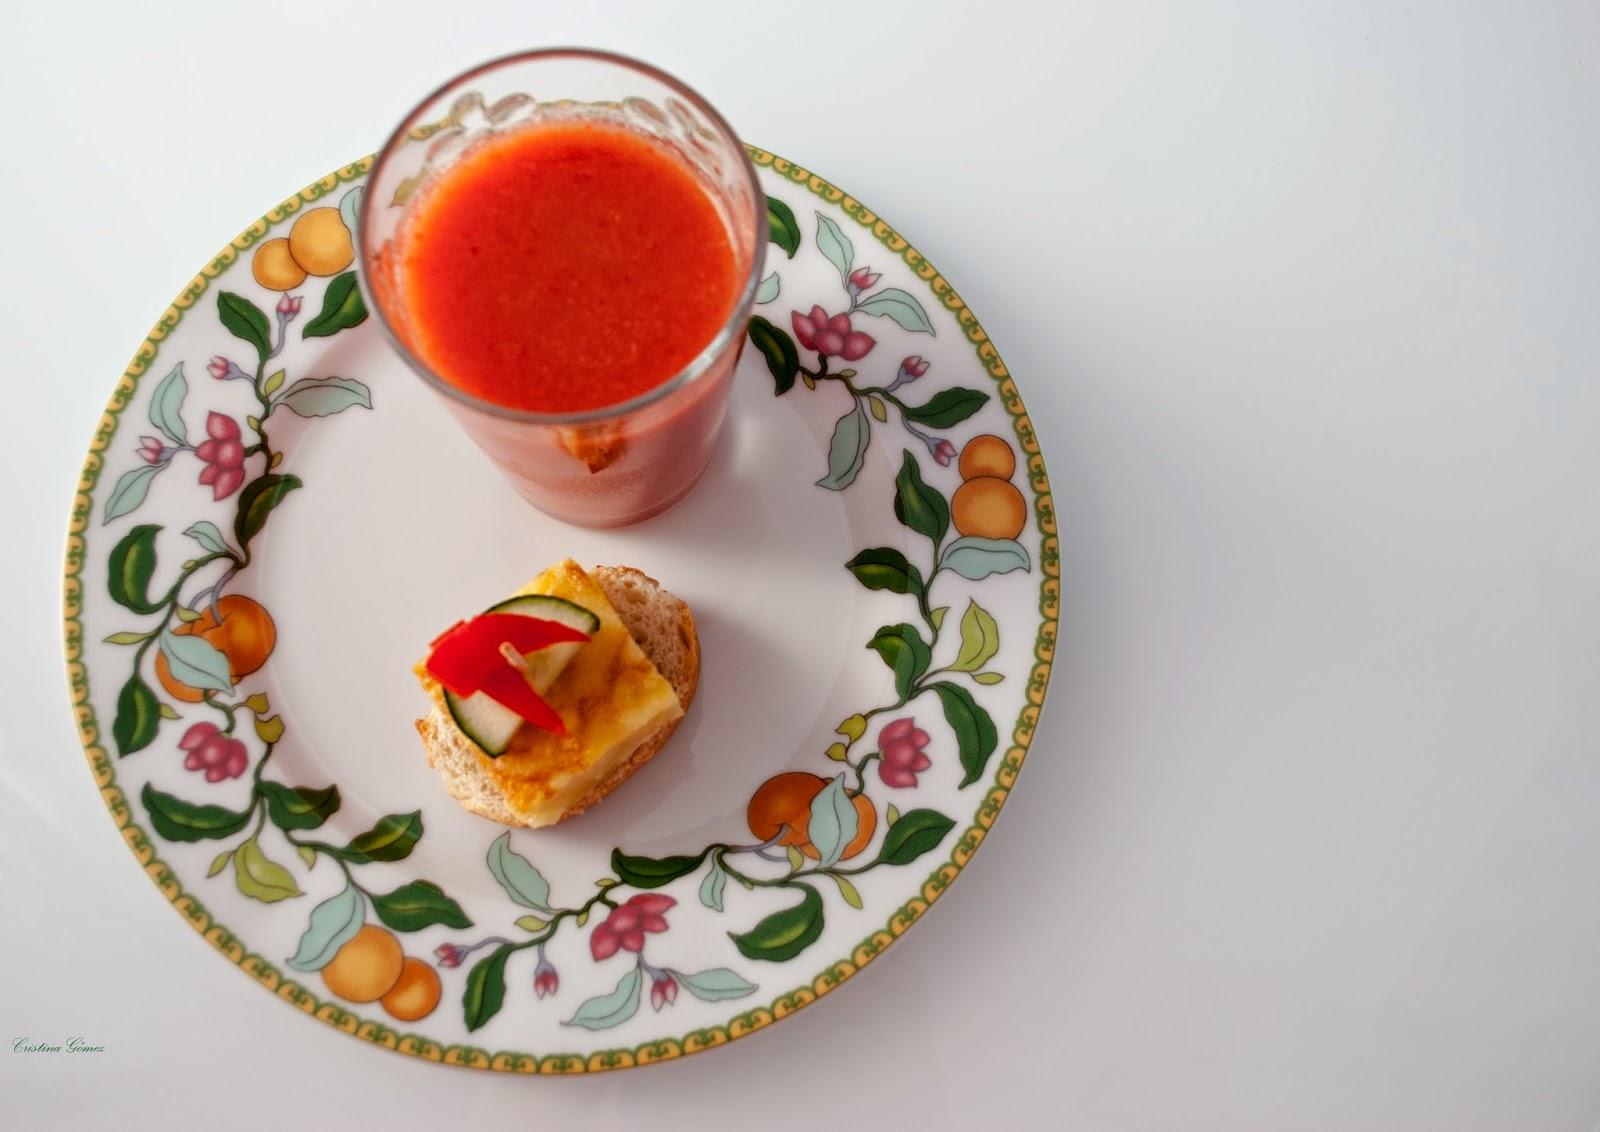 Best Spanish Recipes: Gazpacho & Tortilla de Patata